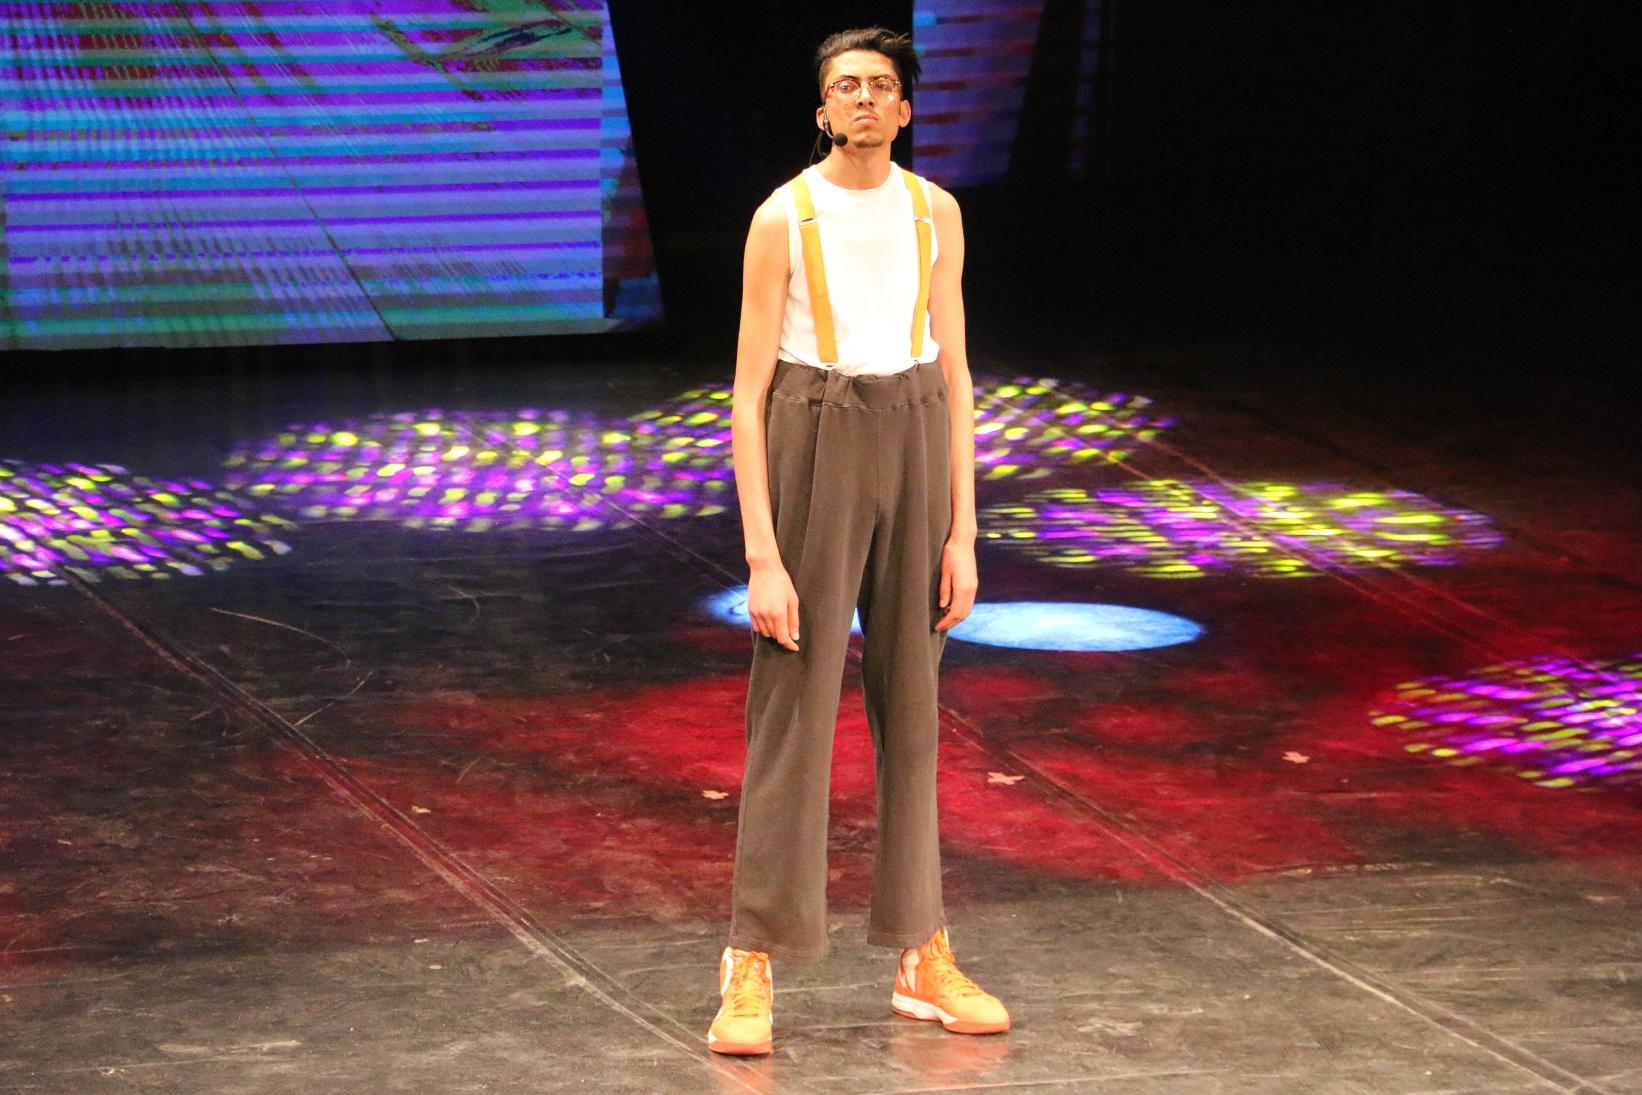 Rayan Kochbati, Grand gagnant de Nescafé Comedy Show